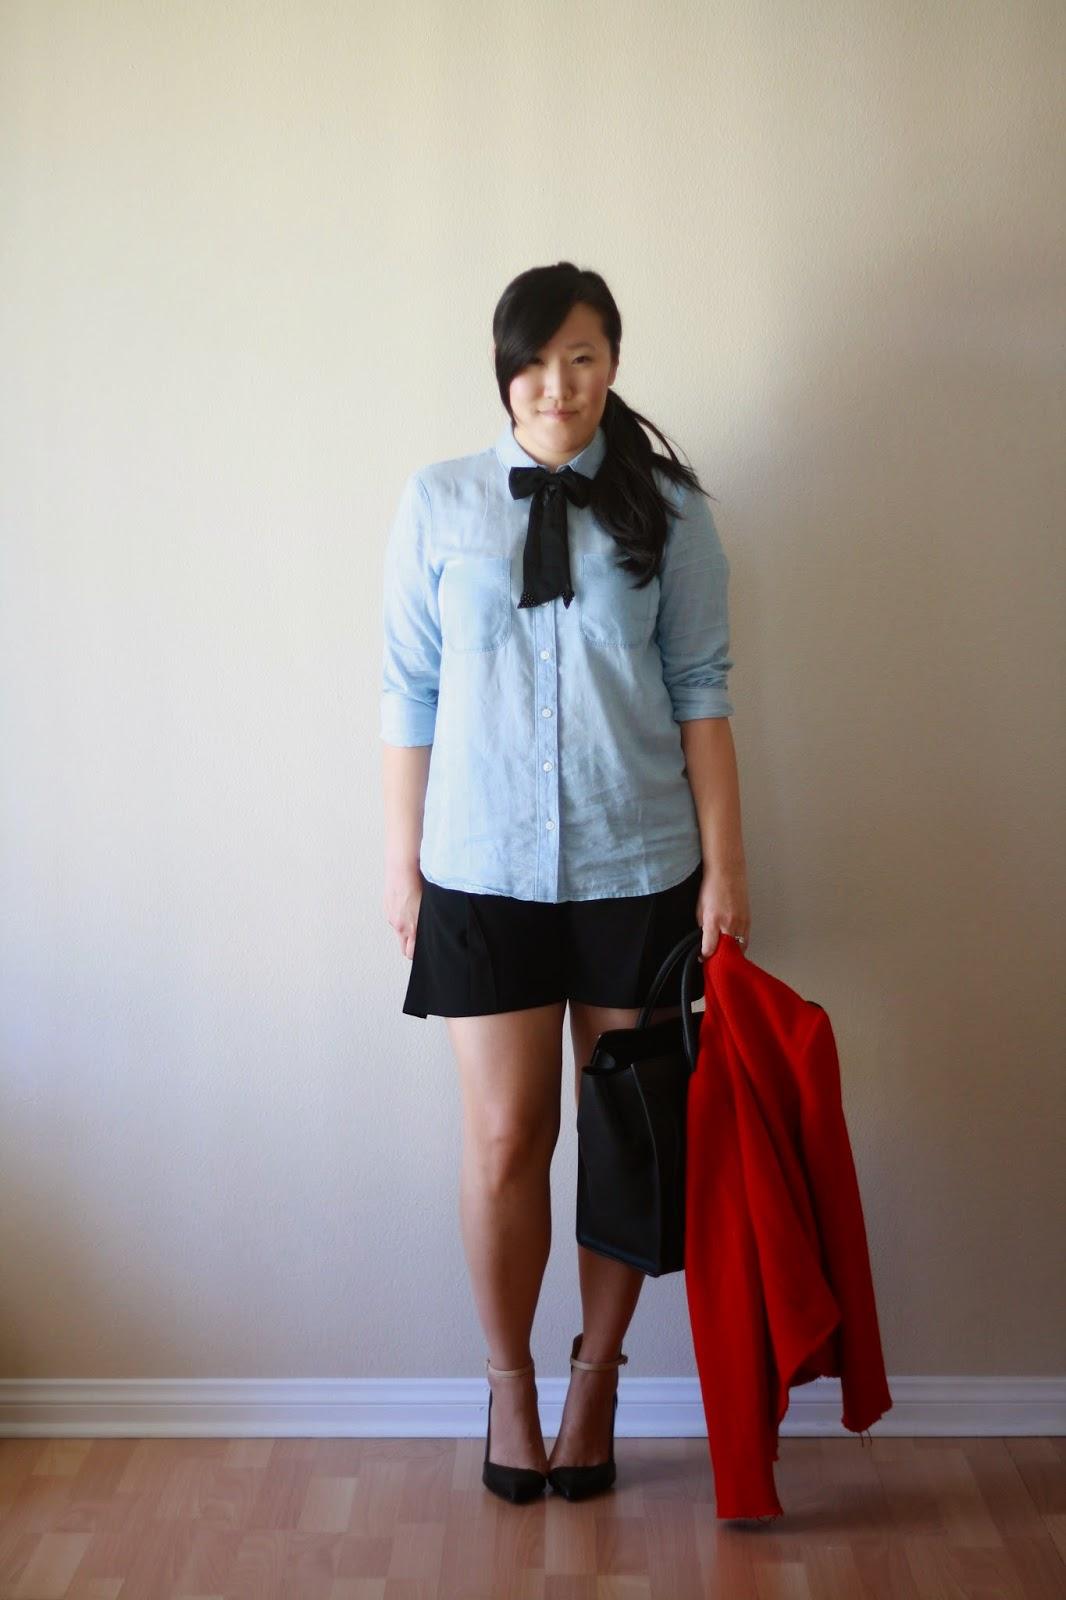 ootd, style, blogger, style blogger, loft, zara, gap, celine bag, bow tie, bow, chambray